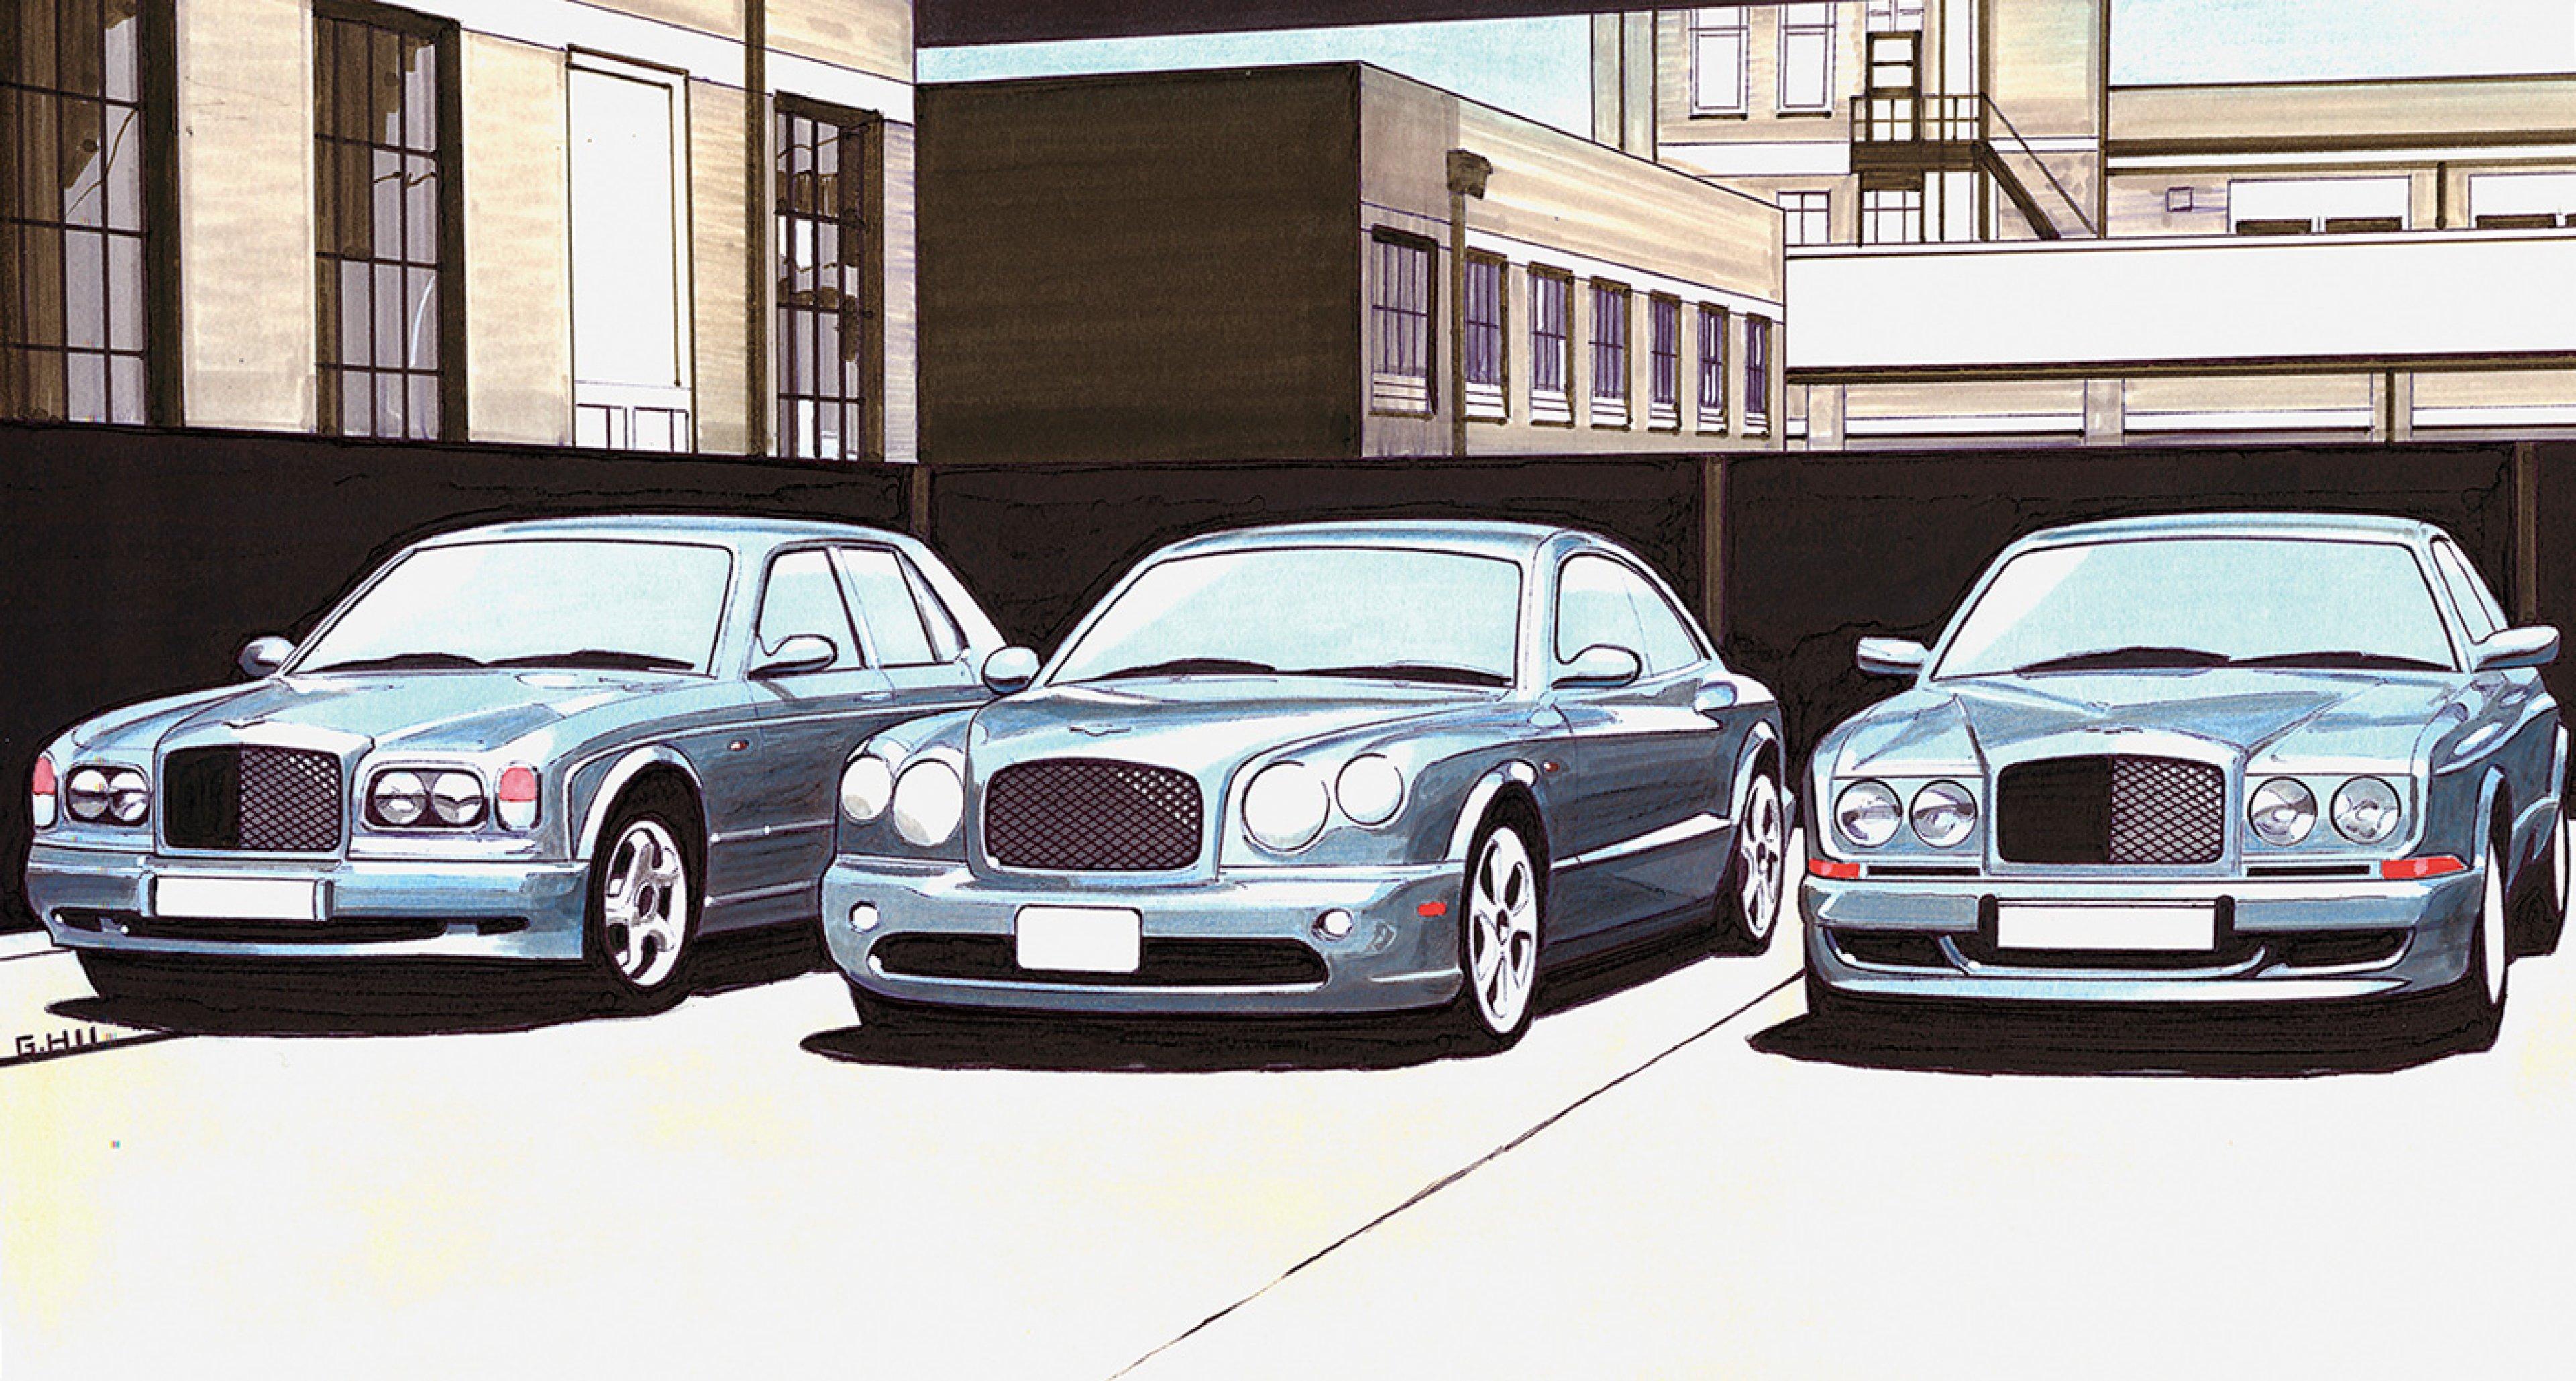 1998: 'Project Bali' envisaged a new Bentley two-door